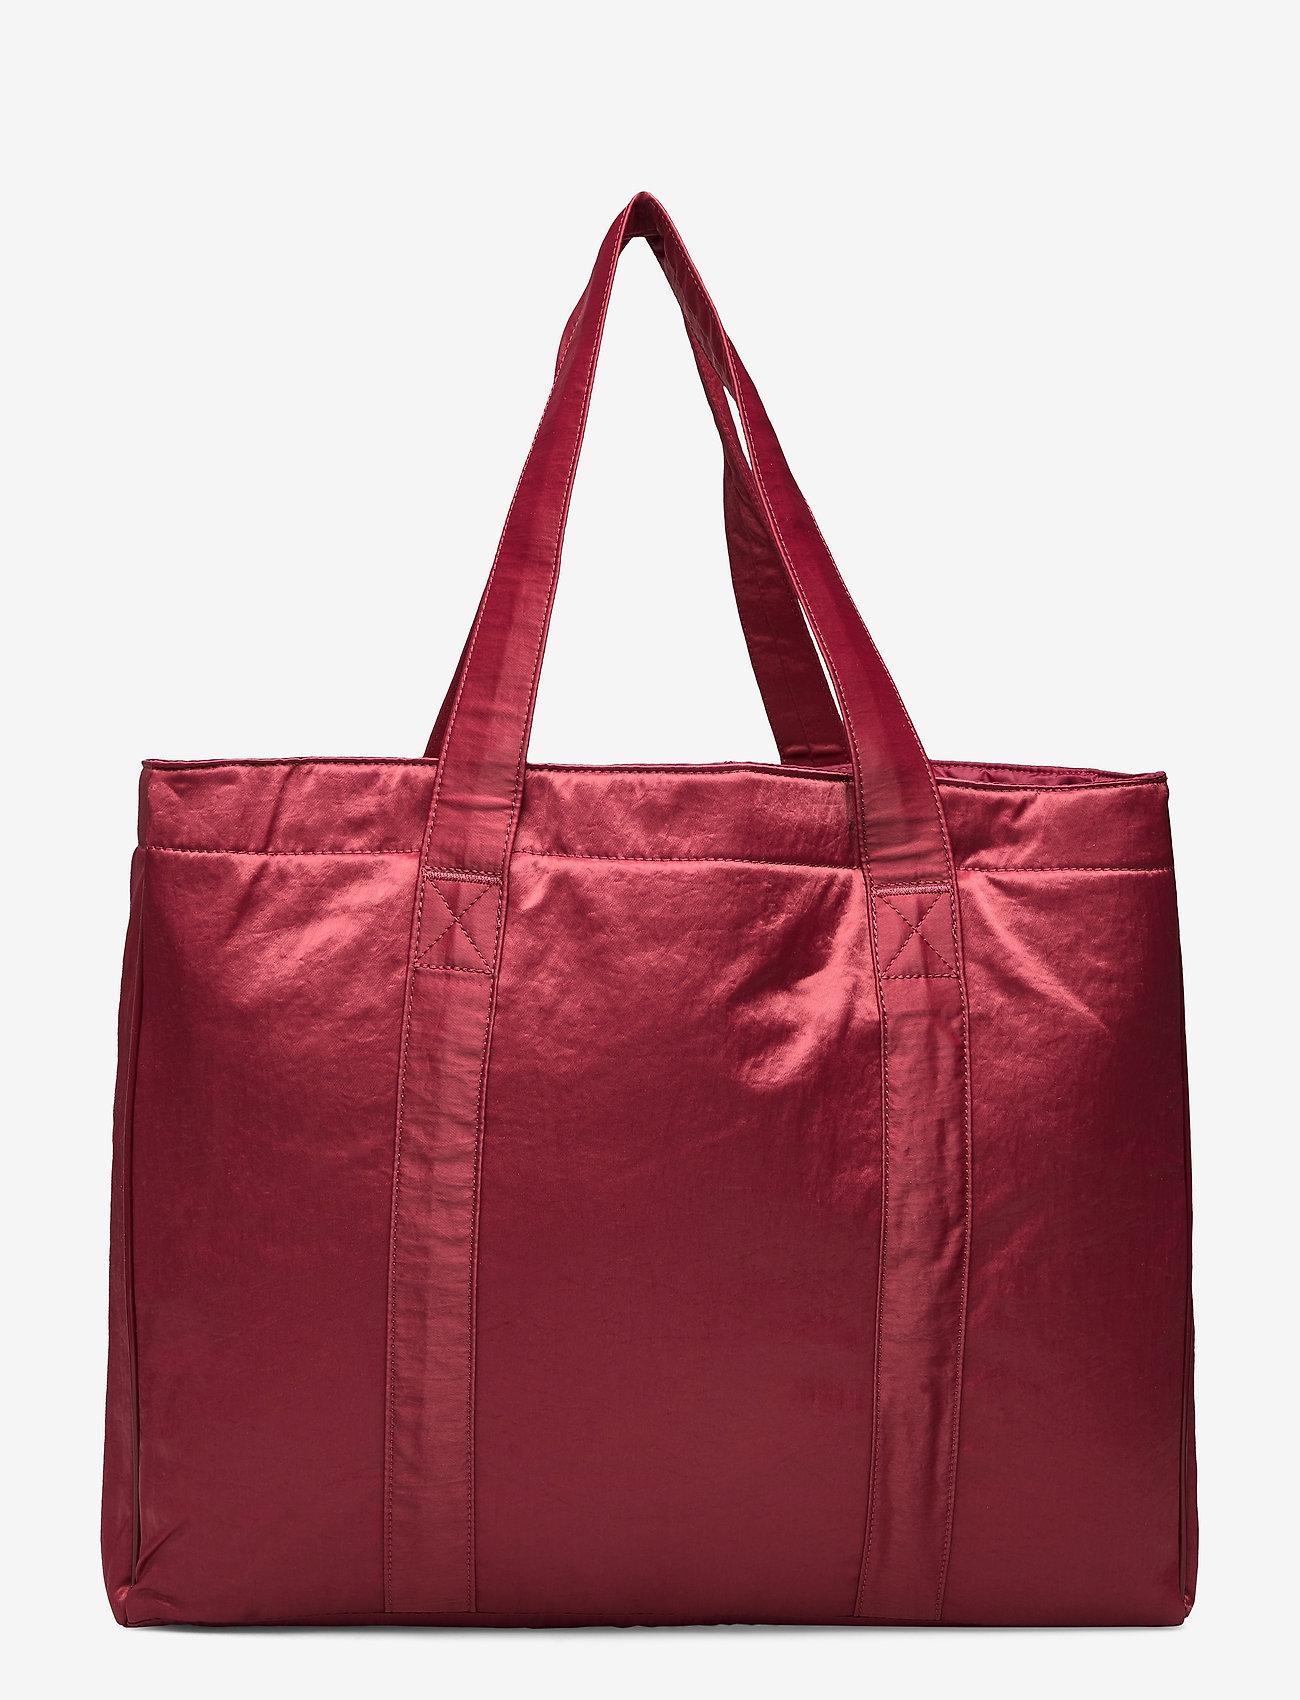 adidas Originals - SHOPPER - tote bags - legred - 1